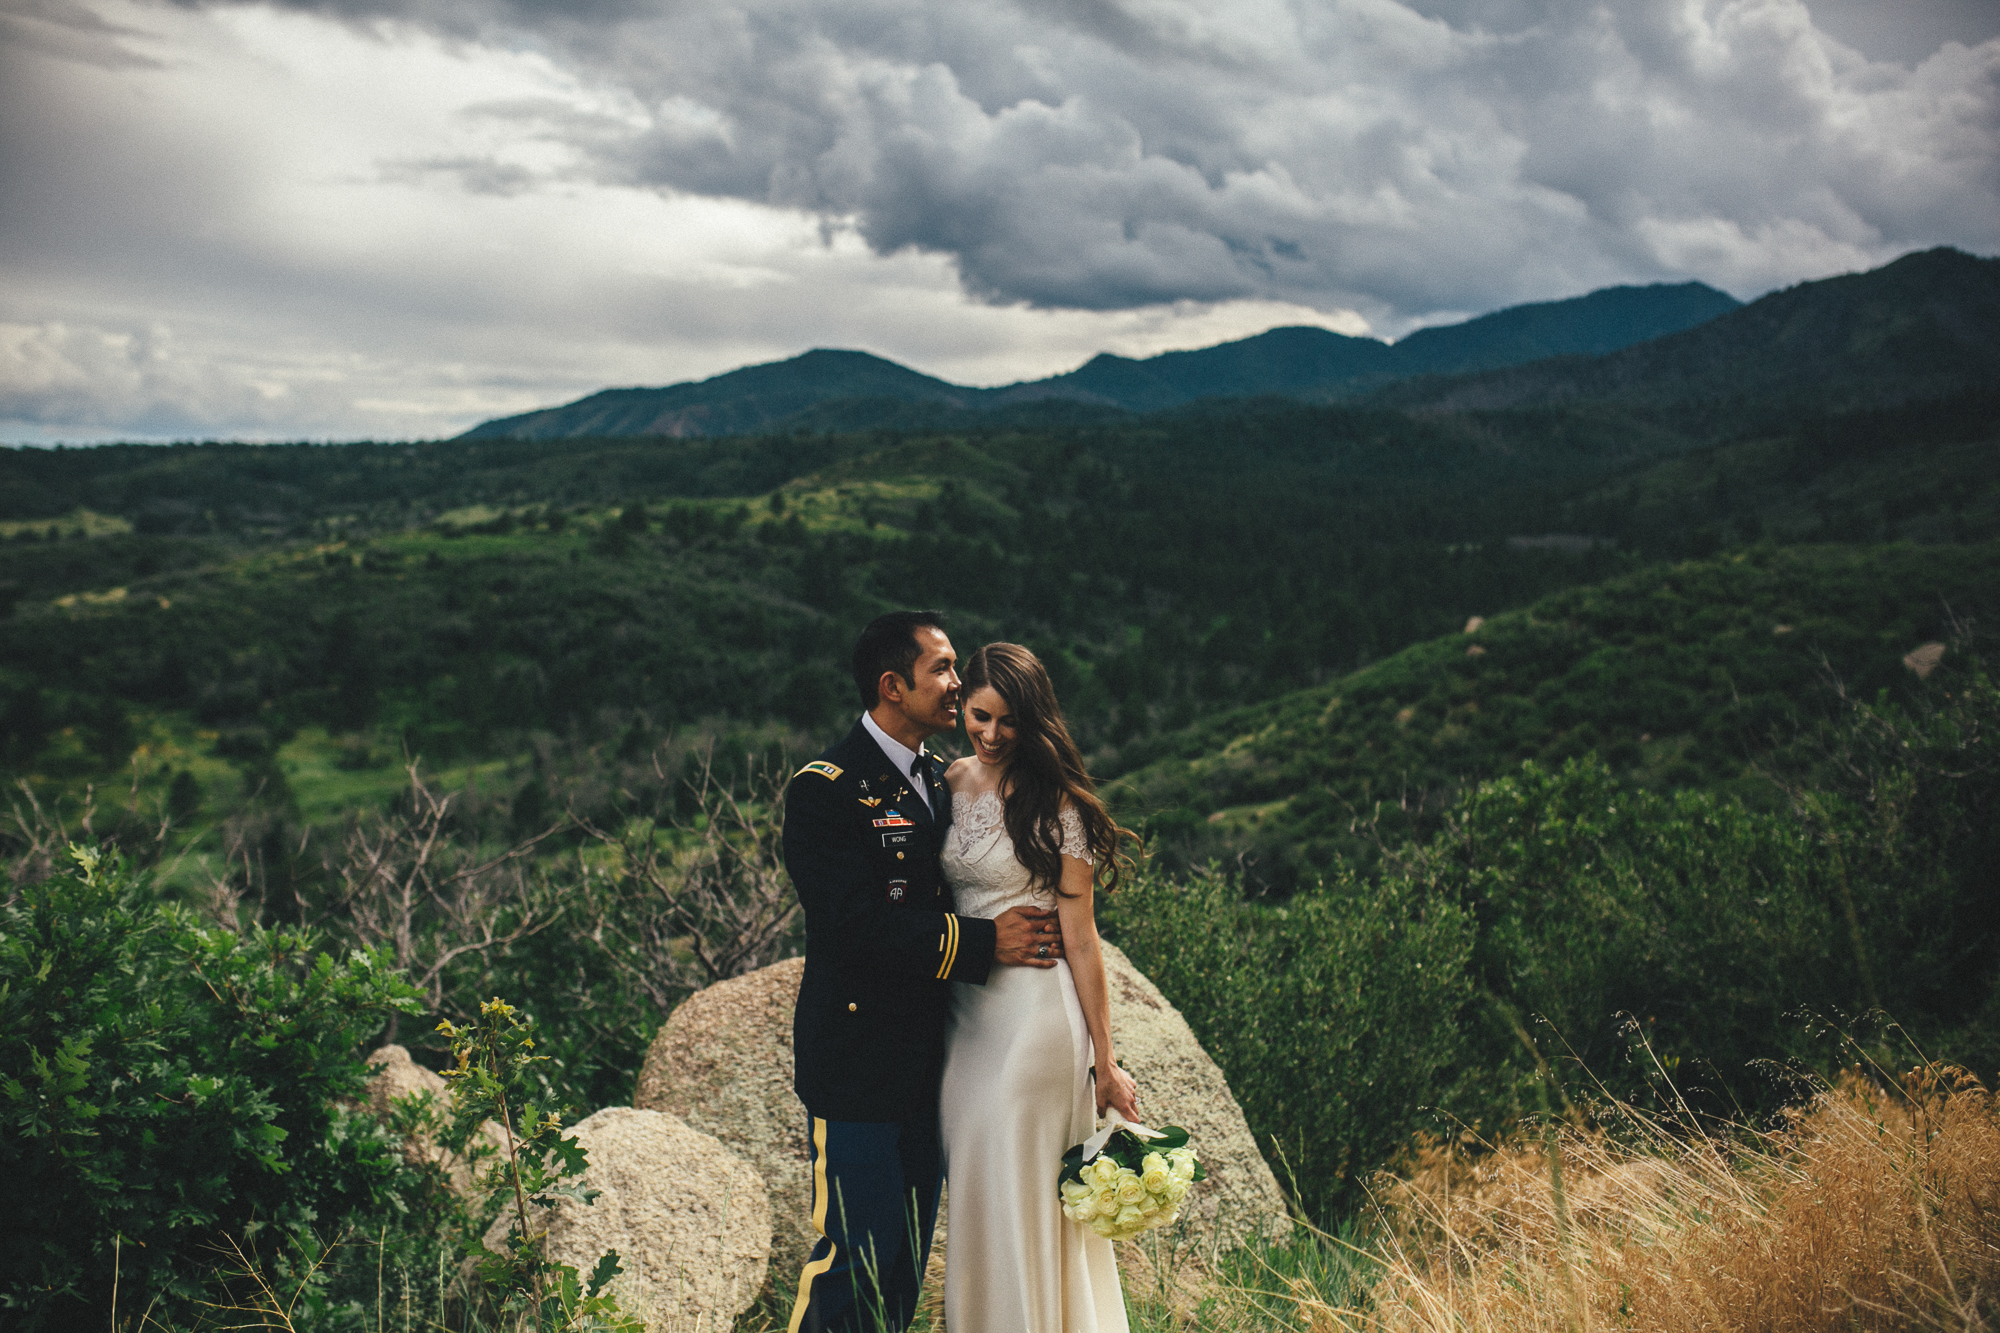 Cheyenne Mountain Wedding Photographer